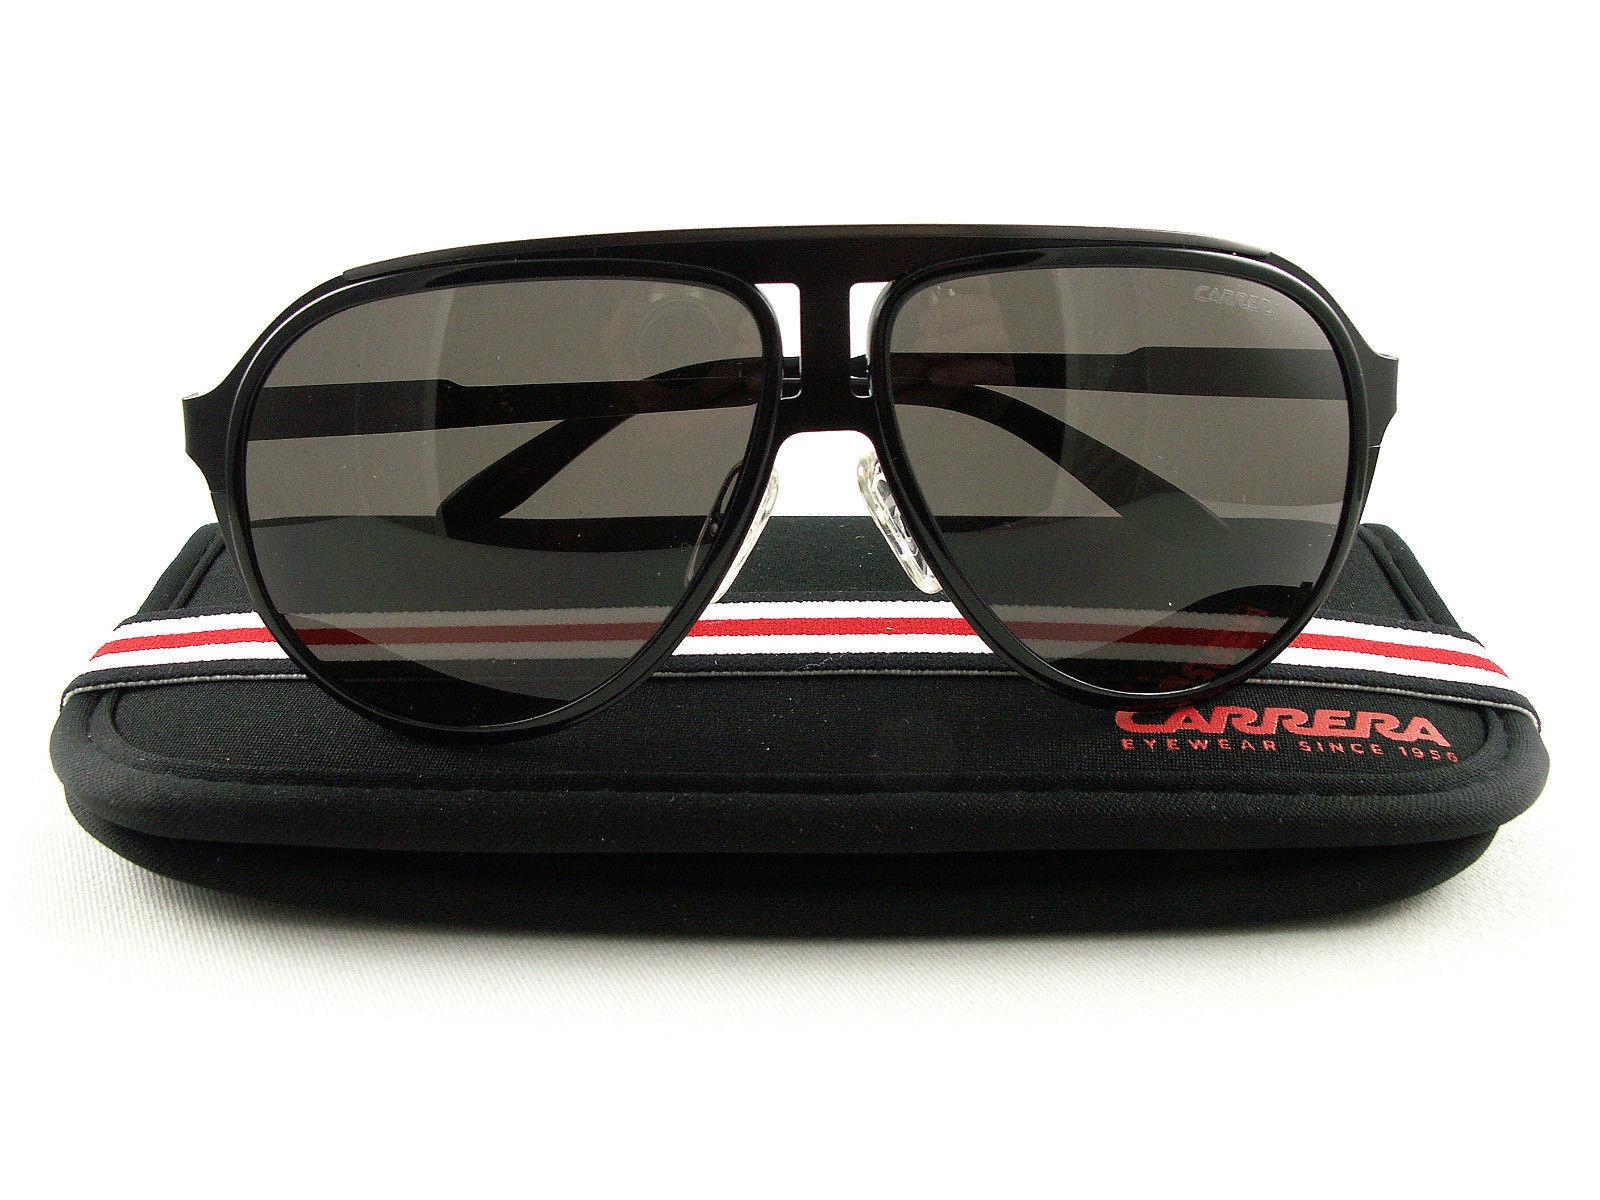 Carrera Men's Black Ruthenium Pilot Sunglasses w/ Grey Frame Lens 100S 0HKQ (NR)